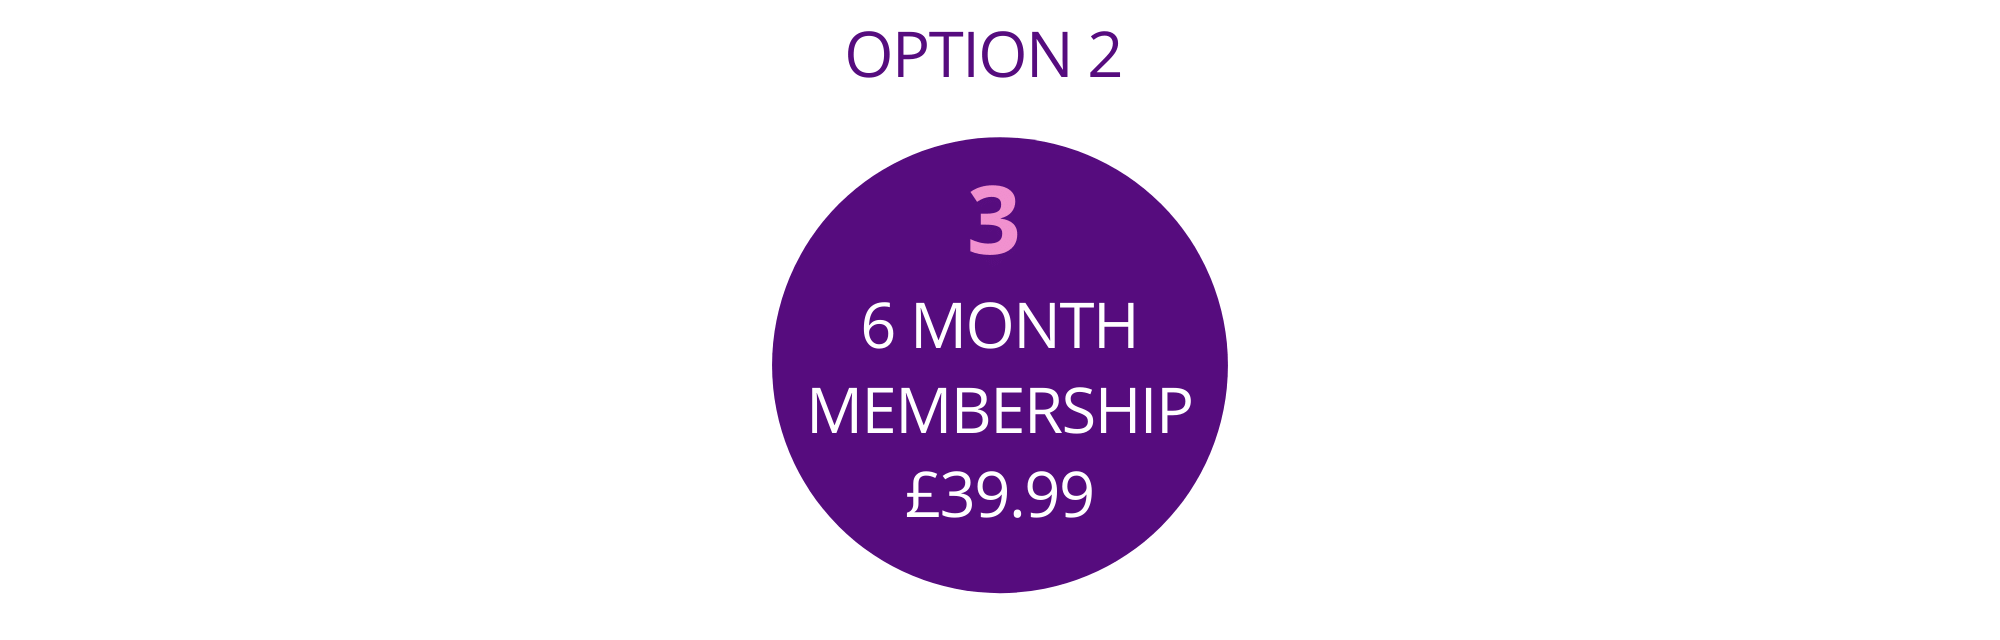 Bandboozled Membership Option 3